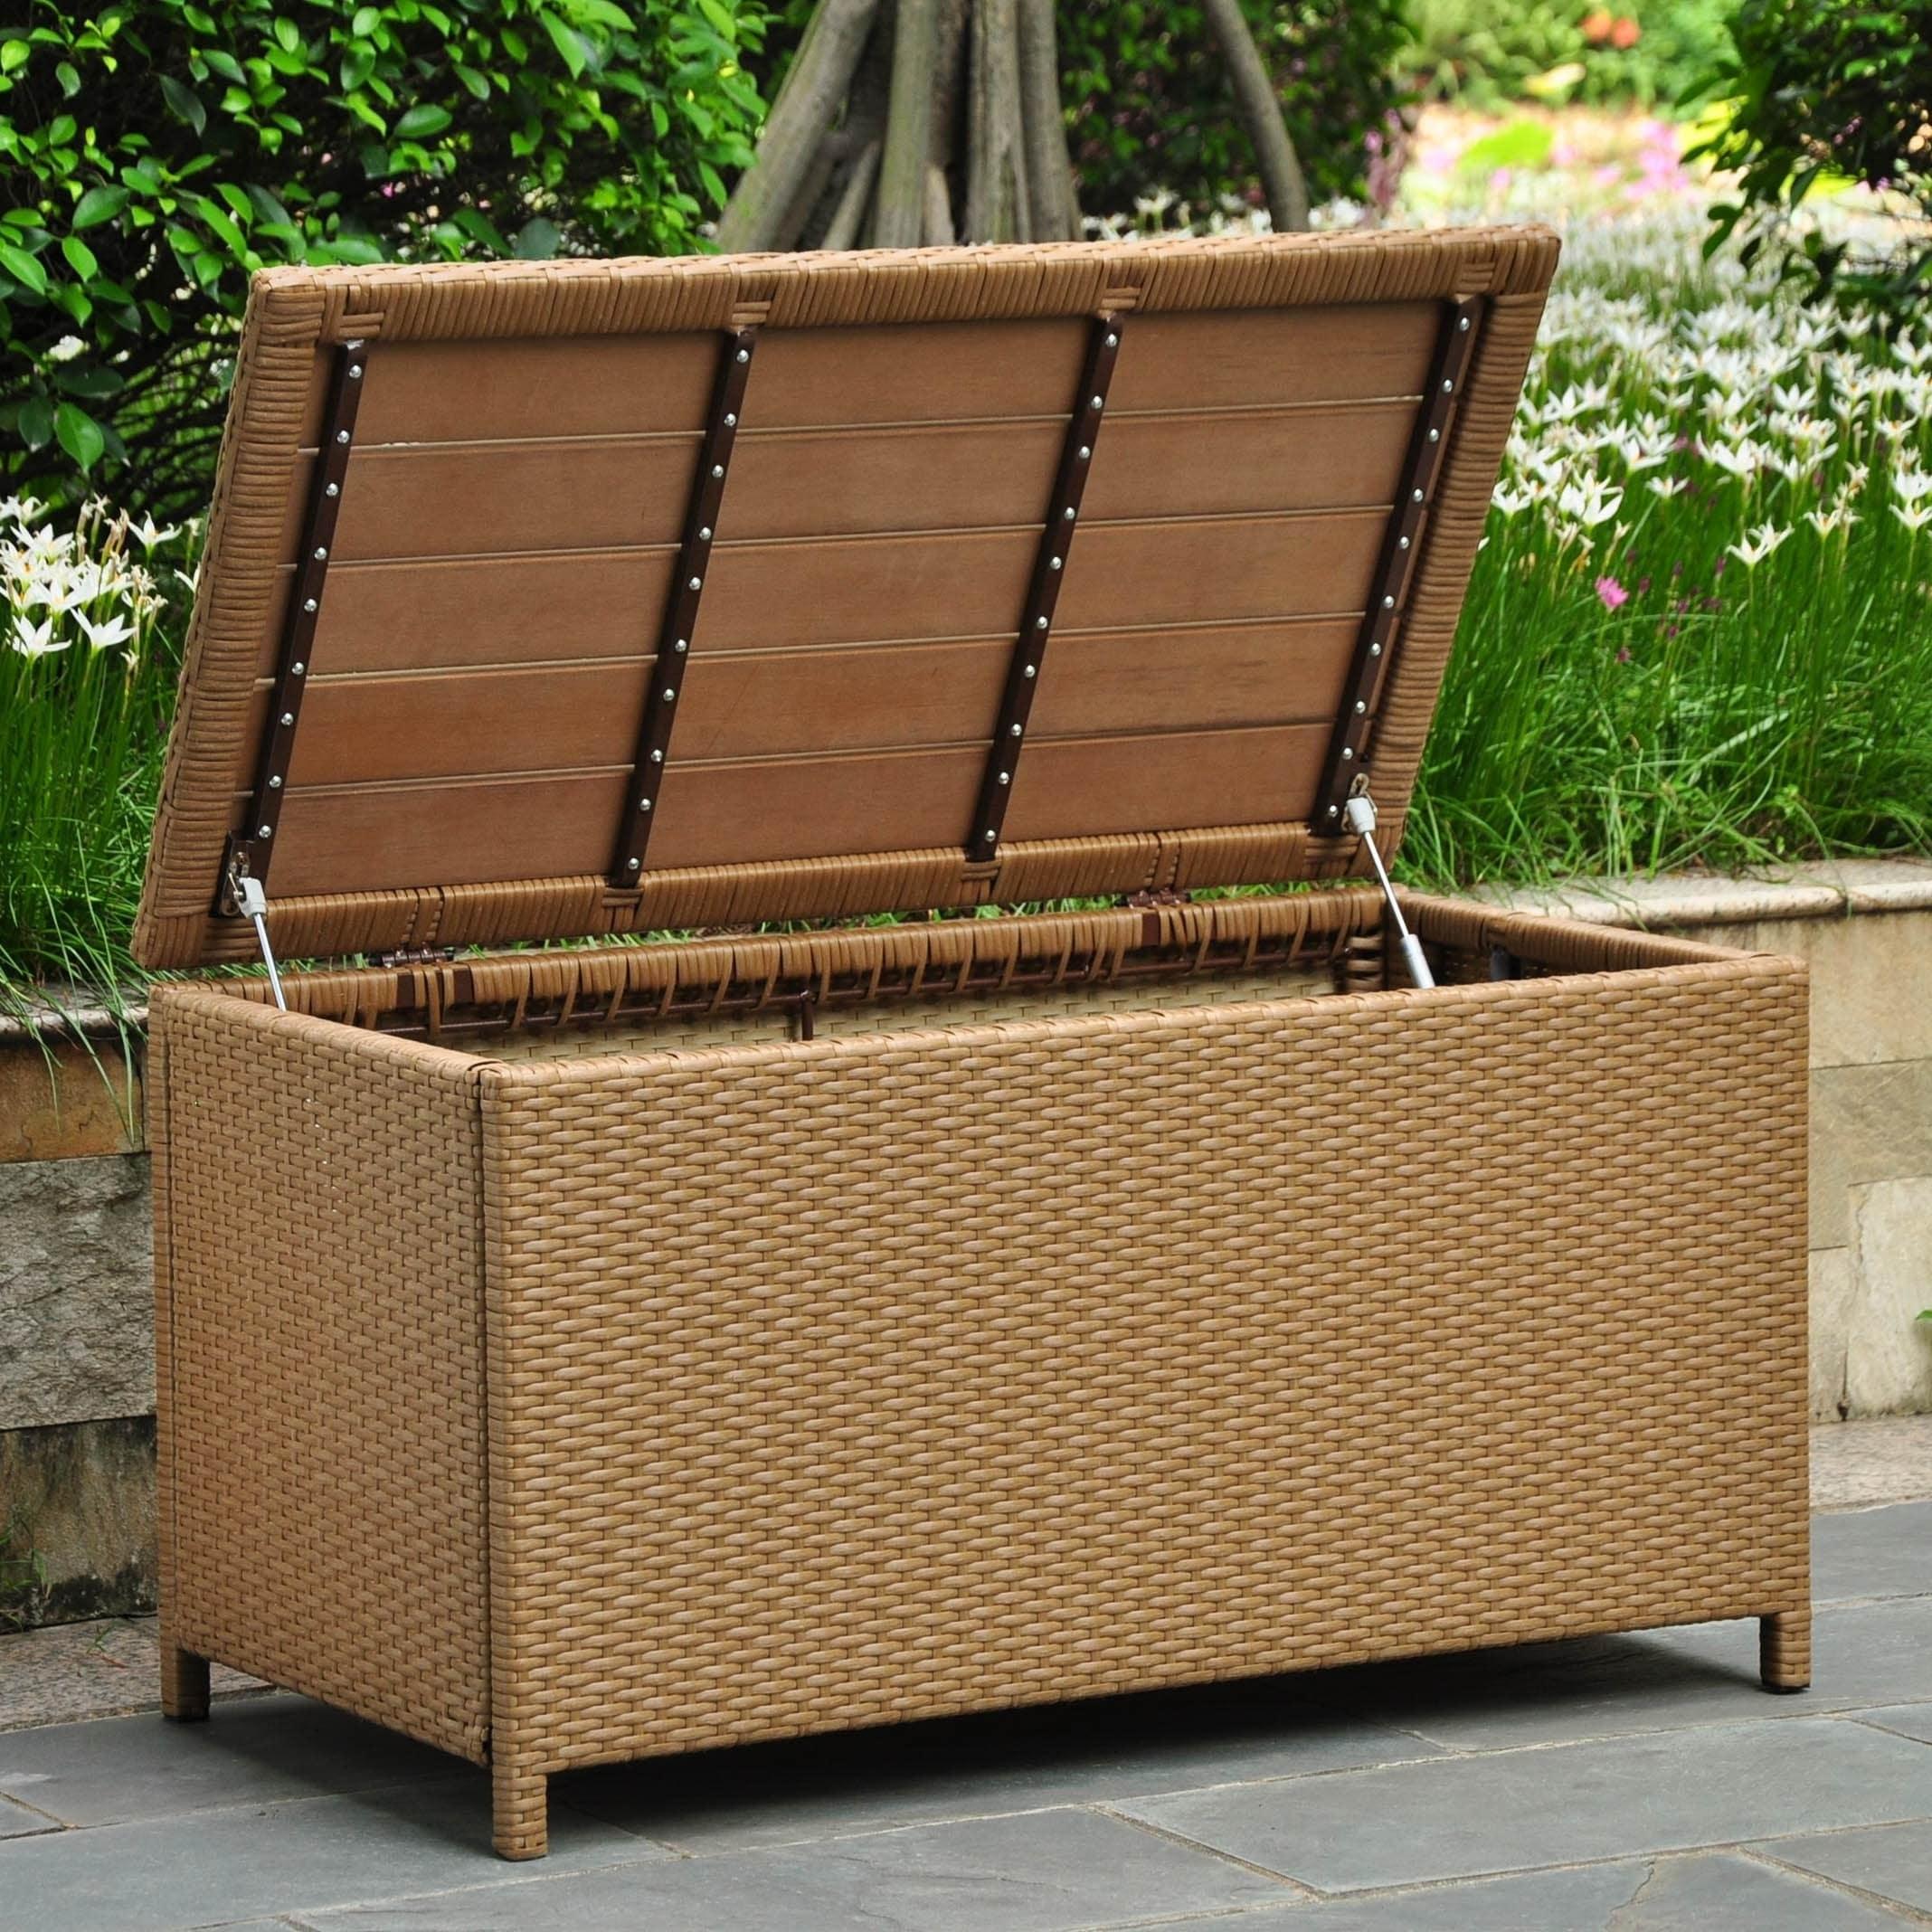 Wondrous International Caravan Barcelona Resin Wicker Aluminum Outdoor Storage Trunk Dailytribune Chair Design For Home Dailytribuneorg